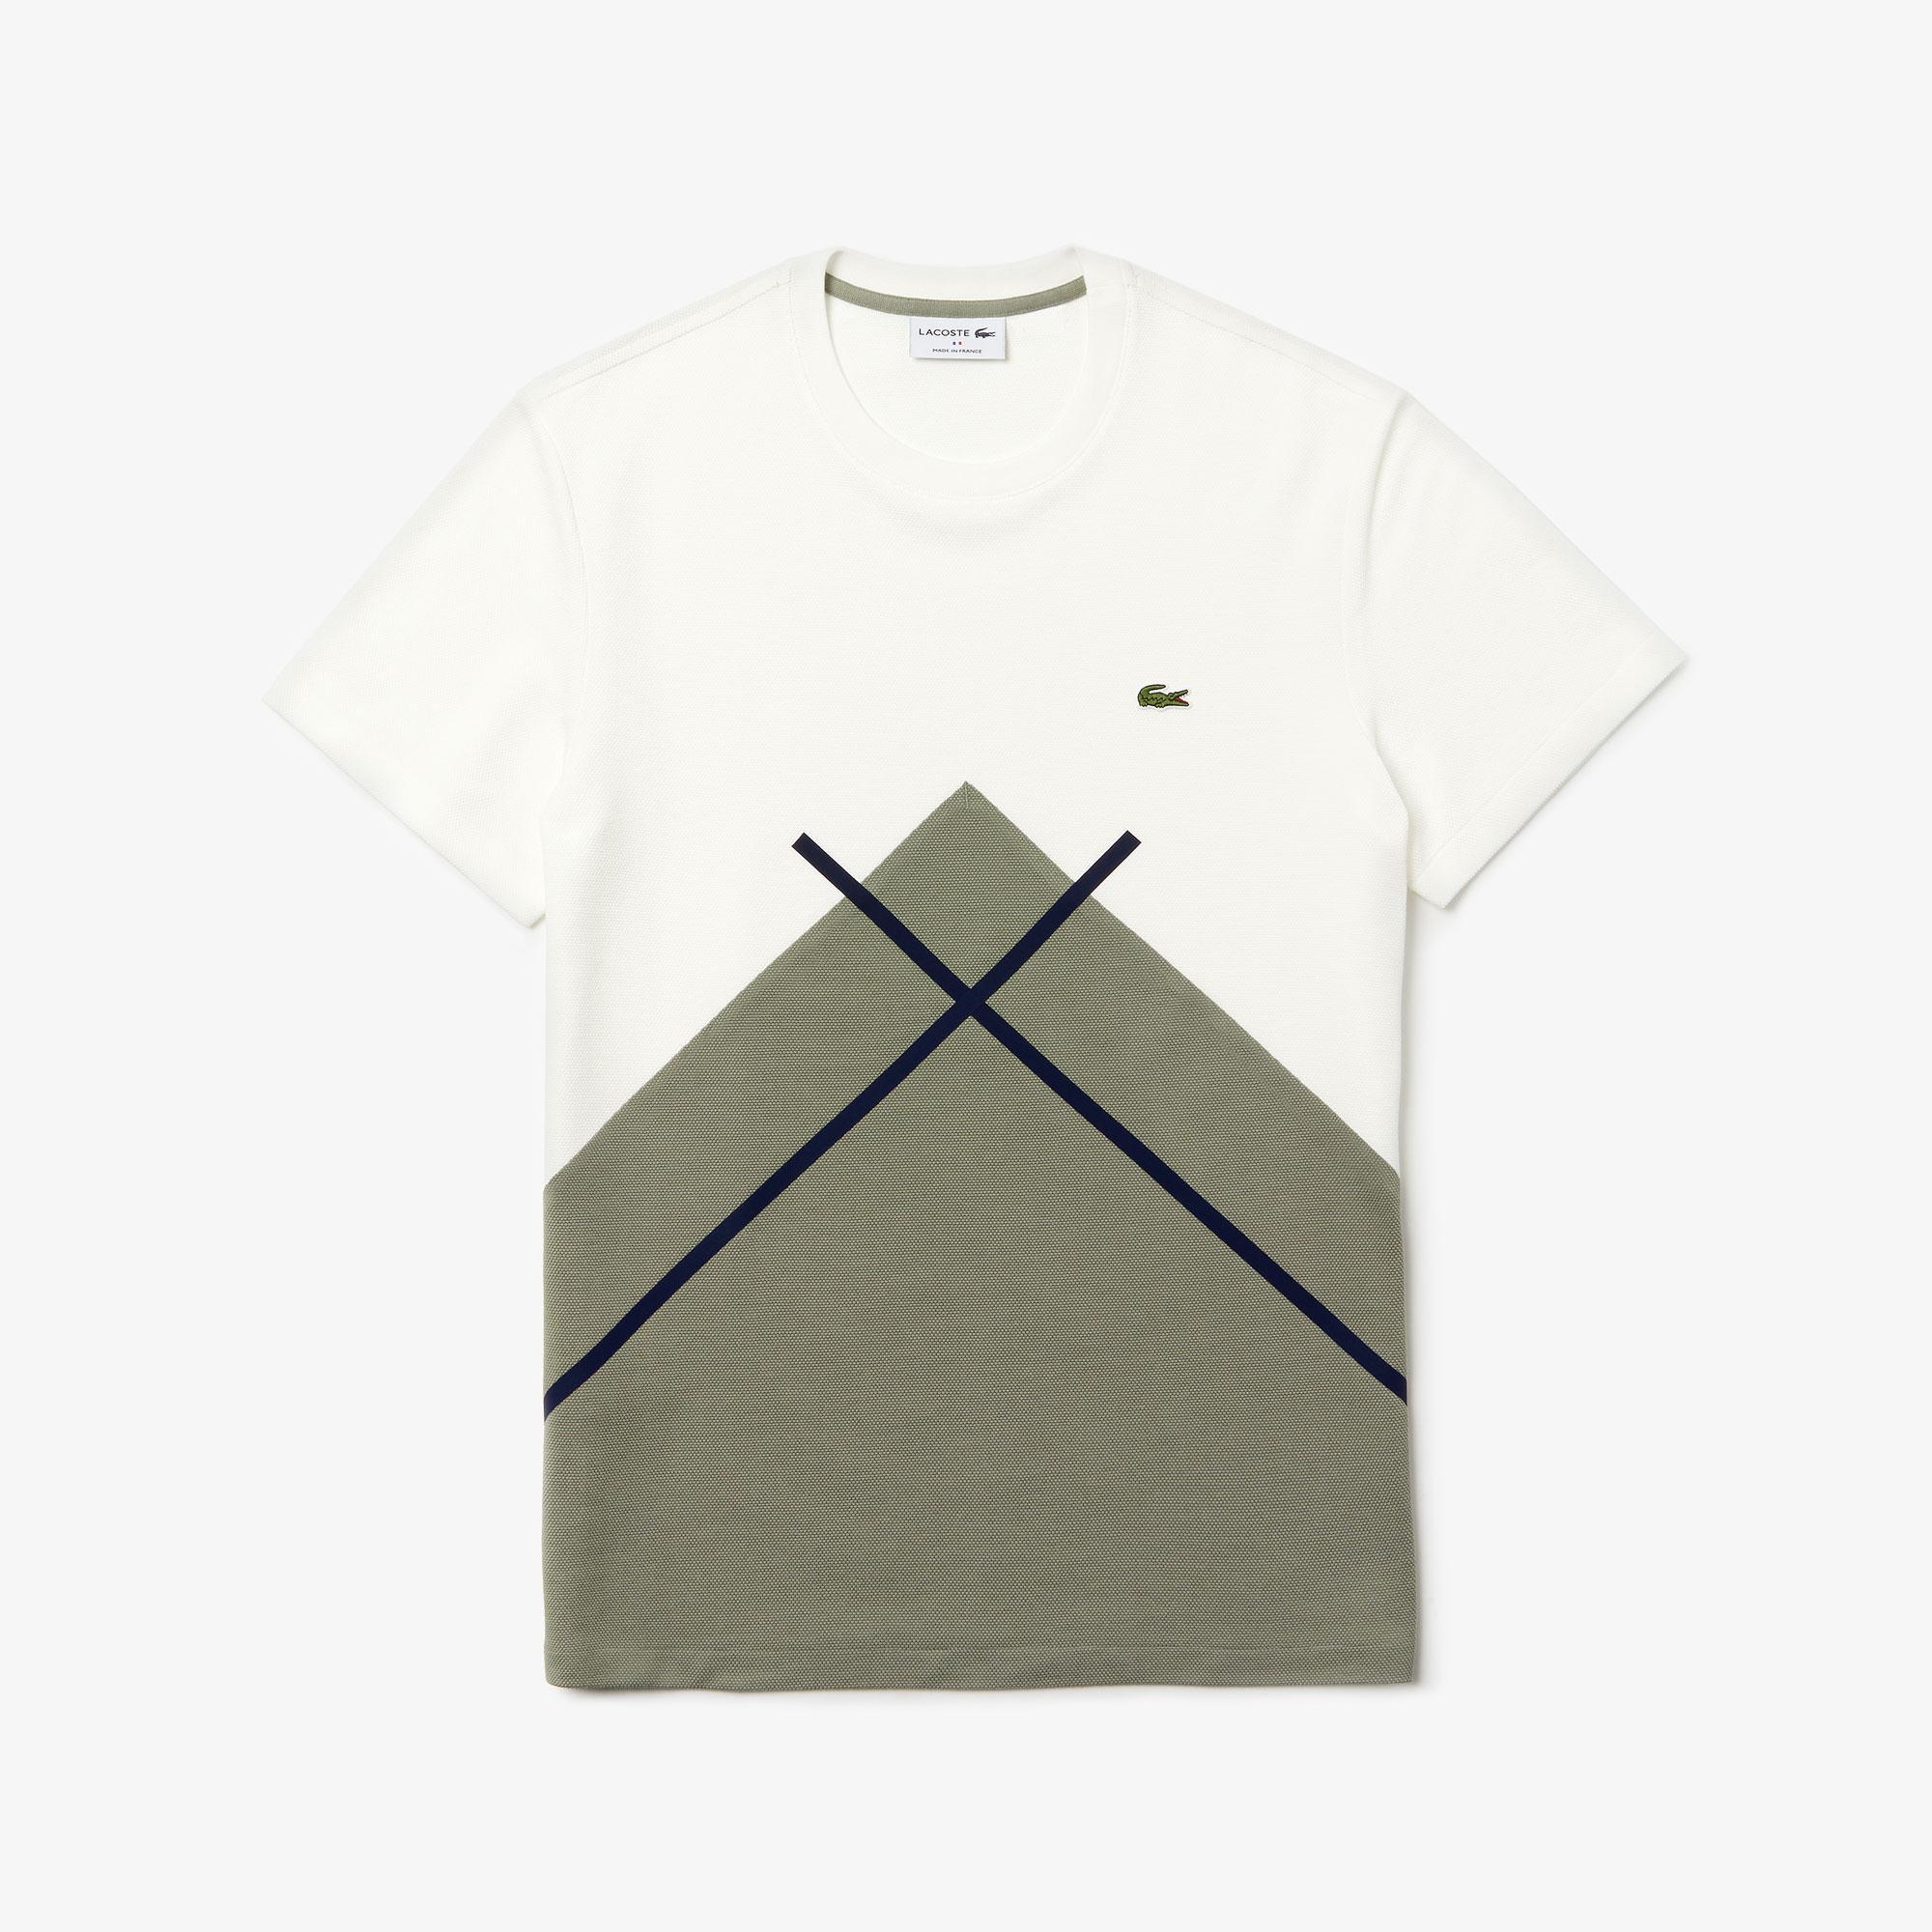 Lacoste футболка чоловіча Made In France з круглим вирізом